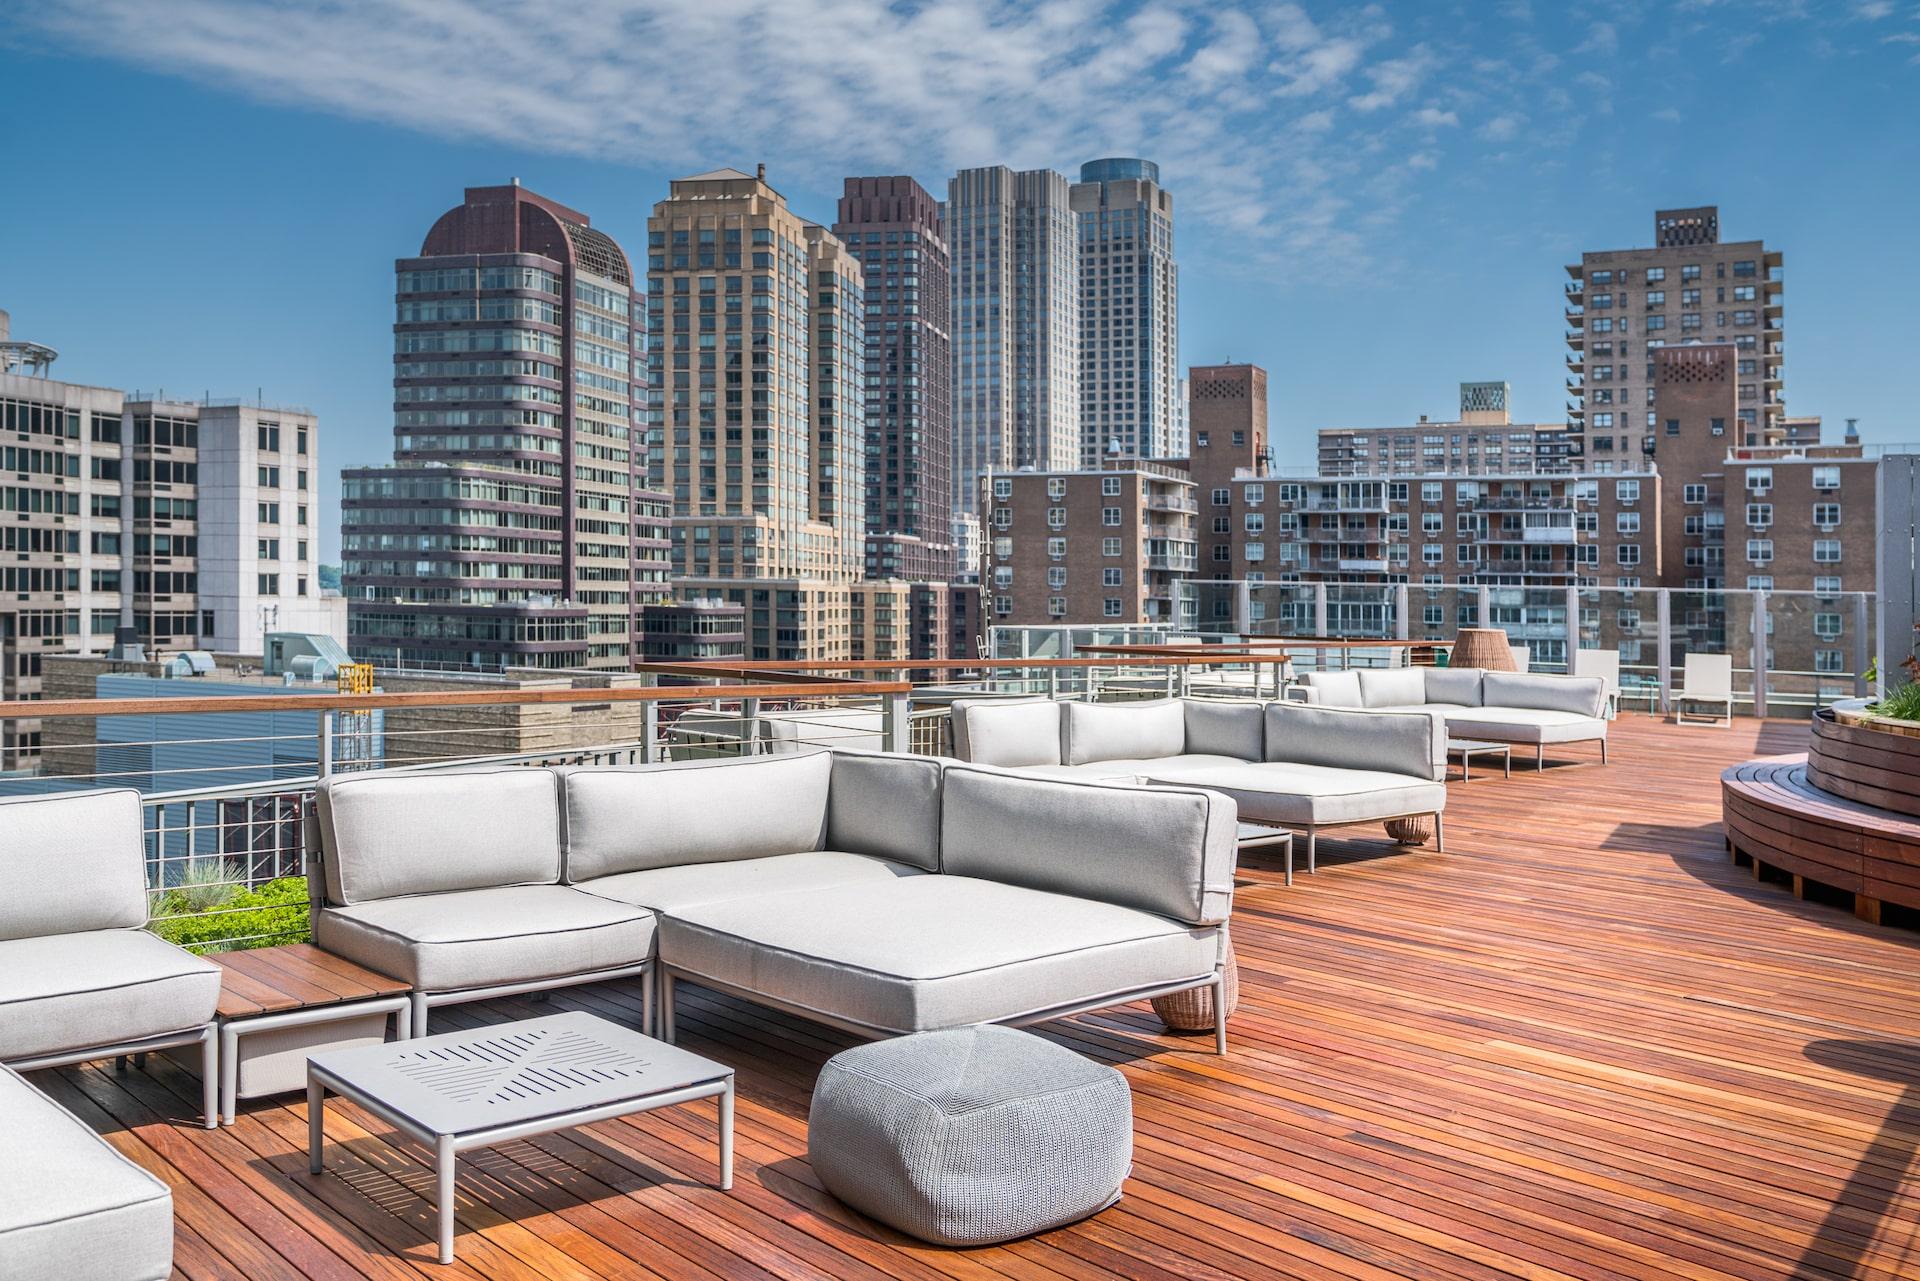 101 West End Avenue Amenities Rooftop